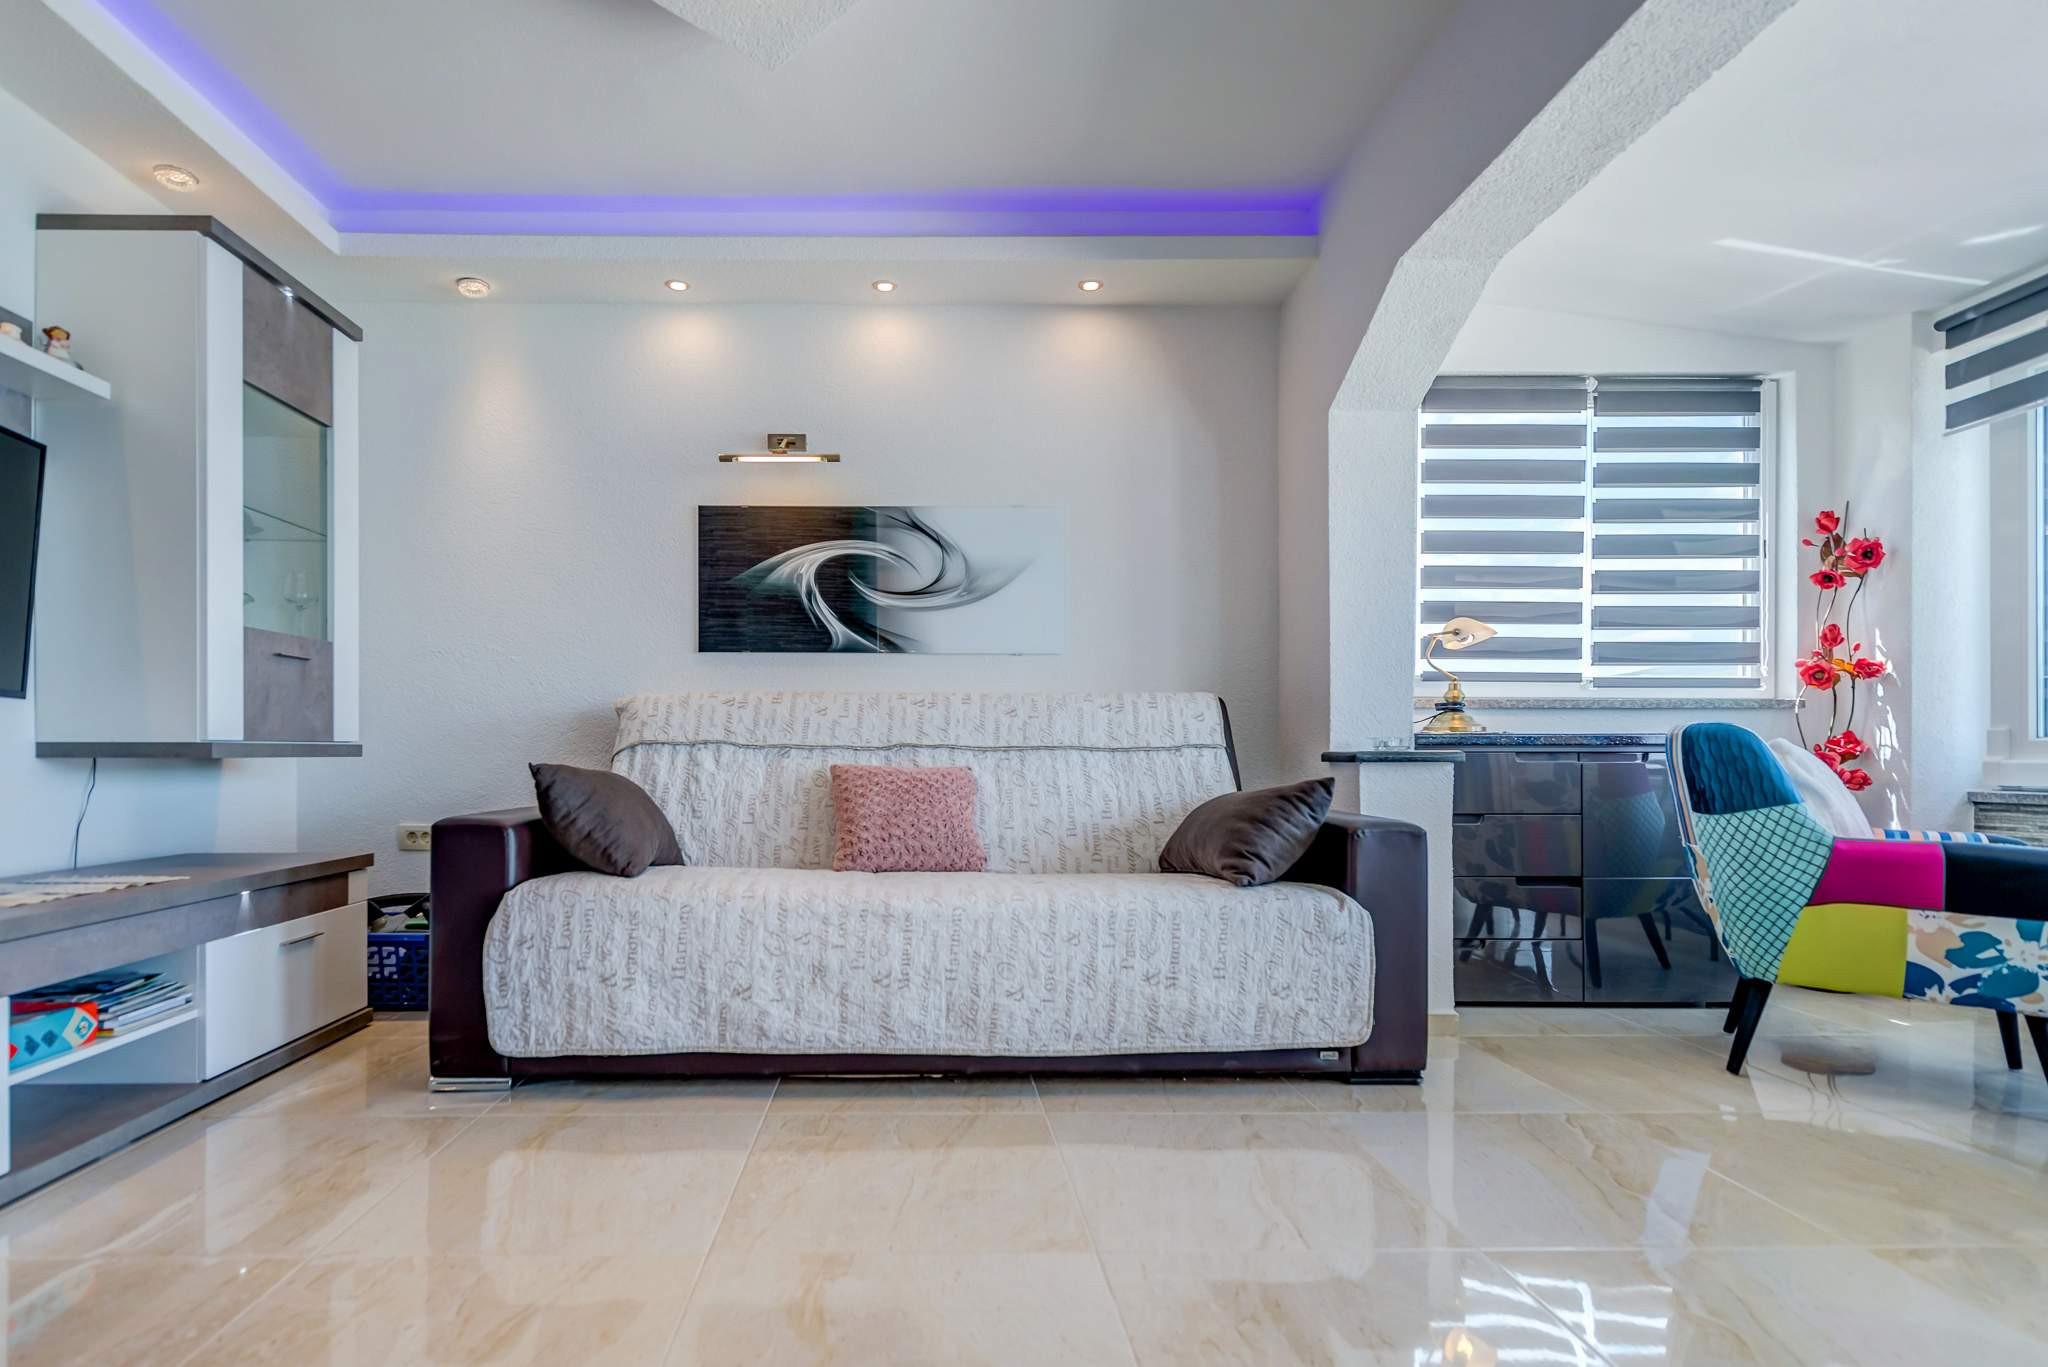 grey hardwood floors grey walls of blue grey living room ideas fresh luxury sofa for small living room within blue grey living room ideas unique teal and grey living room ideas inspirational apartman m za